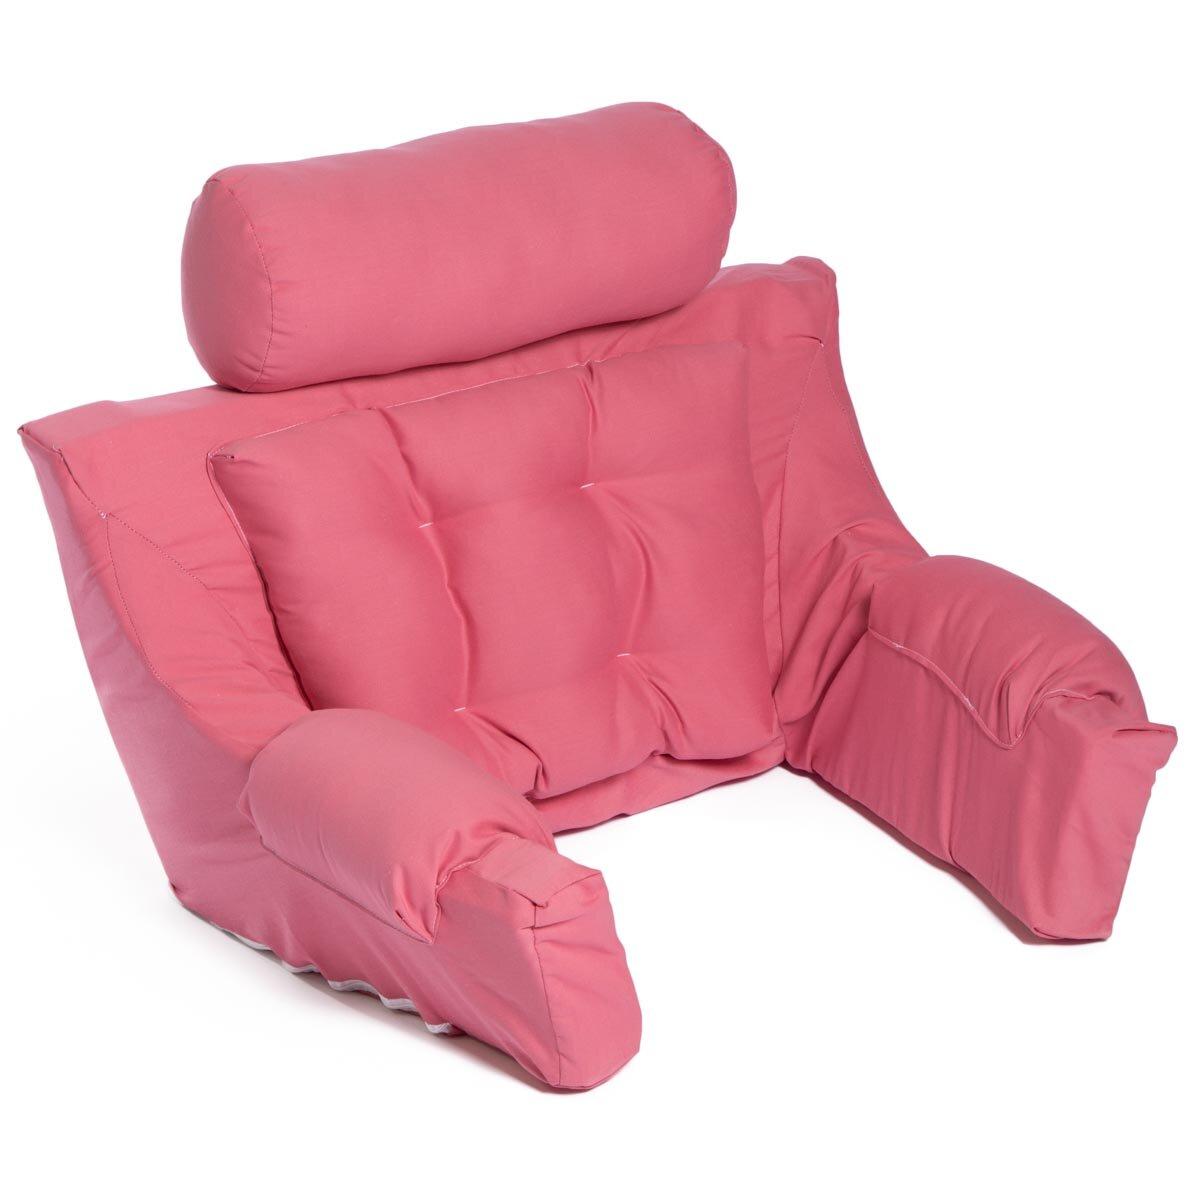 Cool Deluxe Lounger Backrest Frankydiablos Diy Chair Ideas Frankydiabloscom